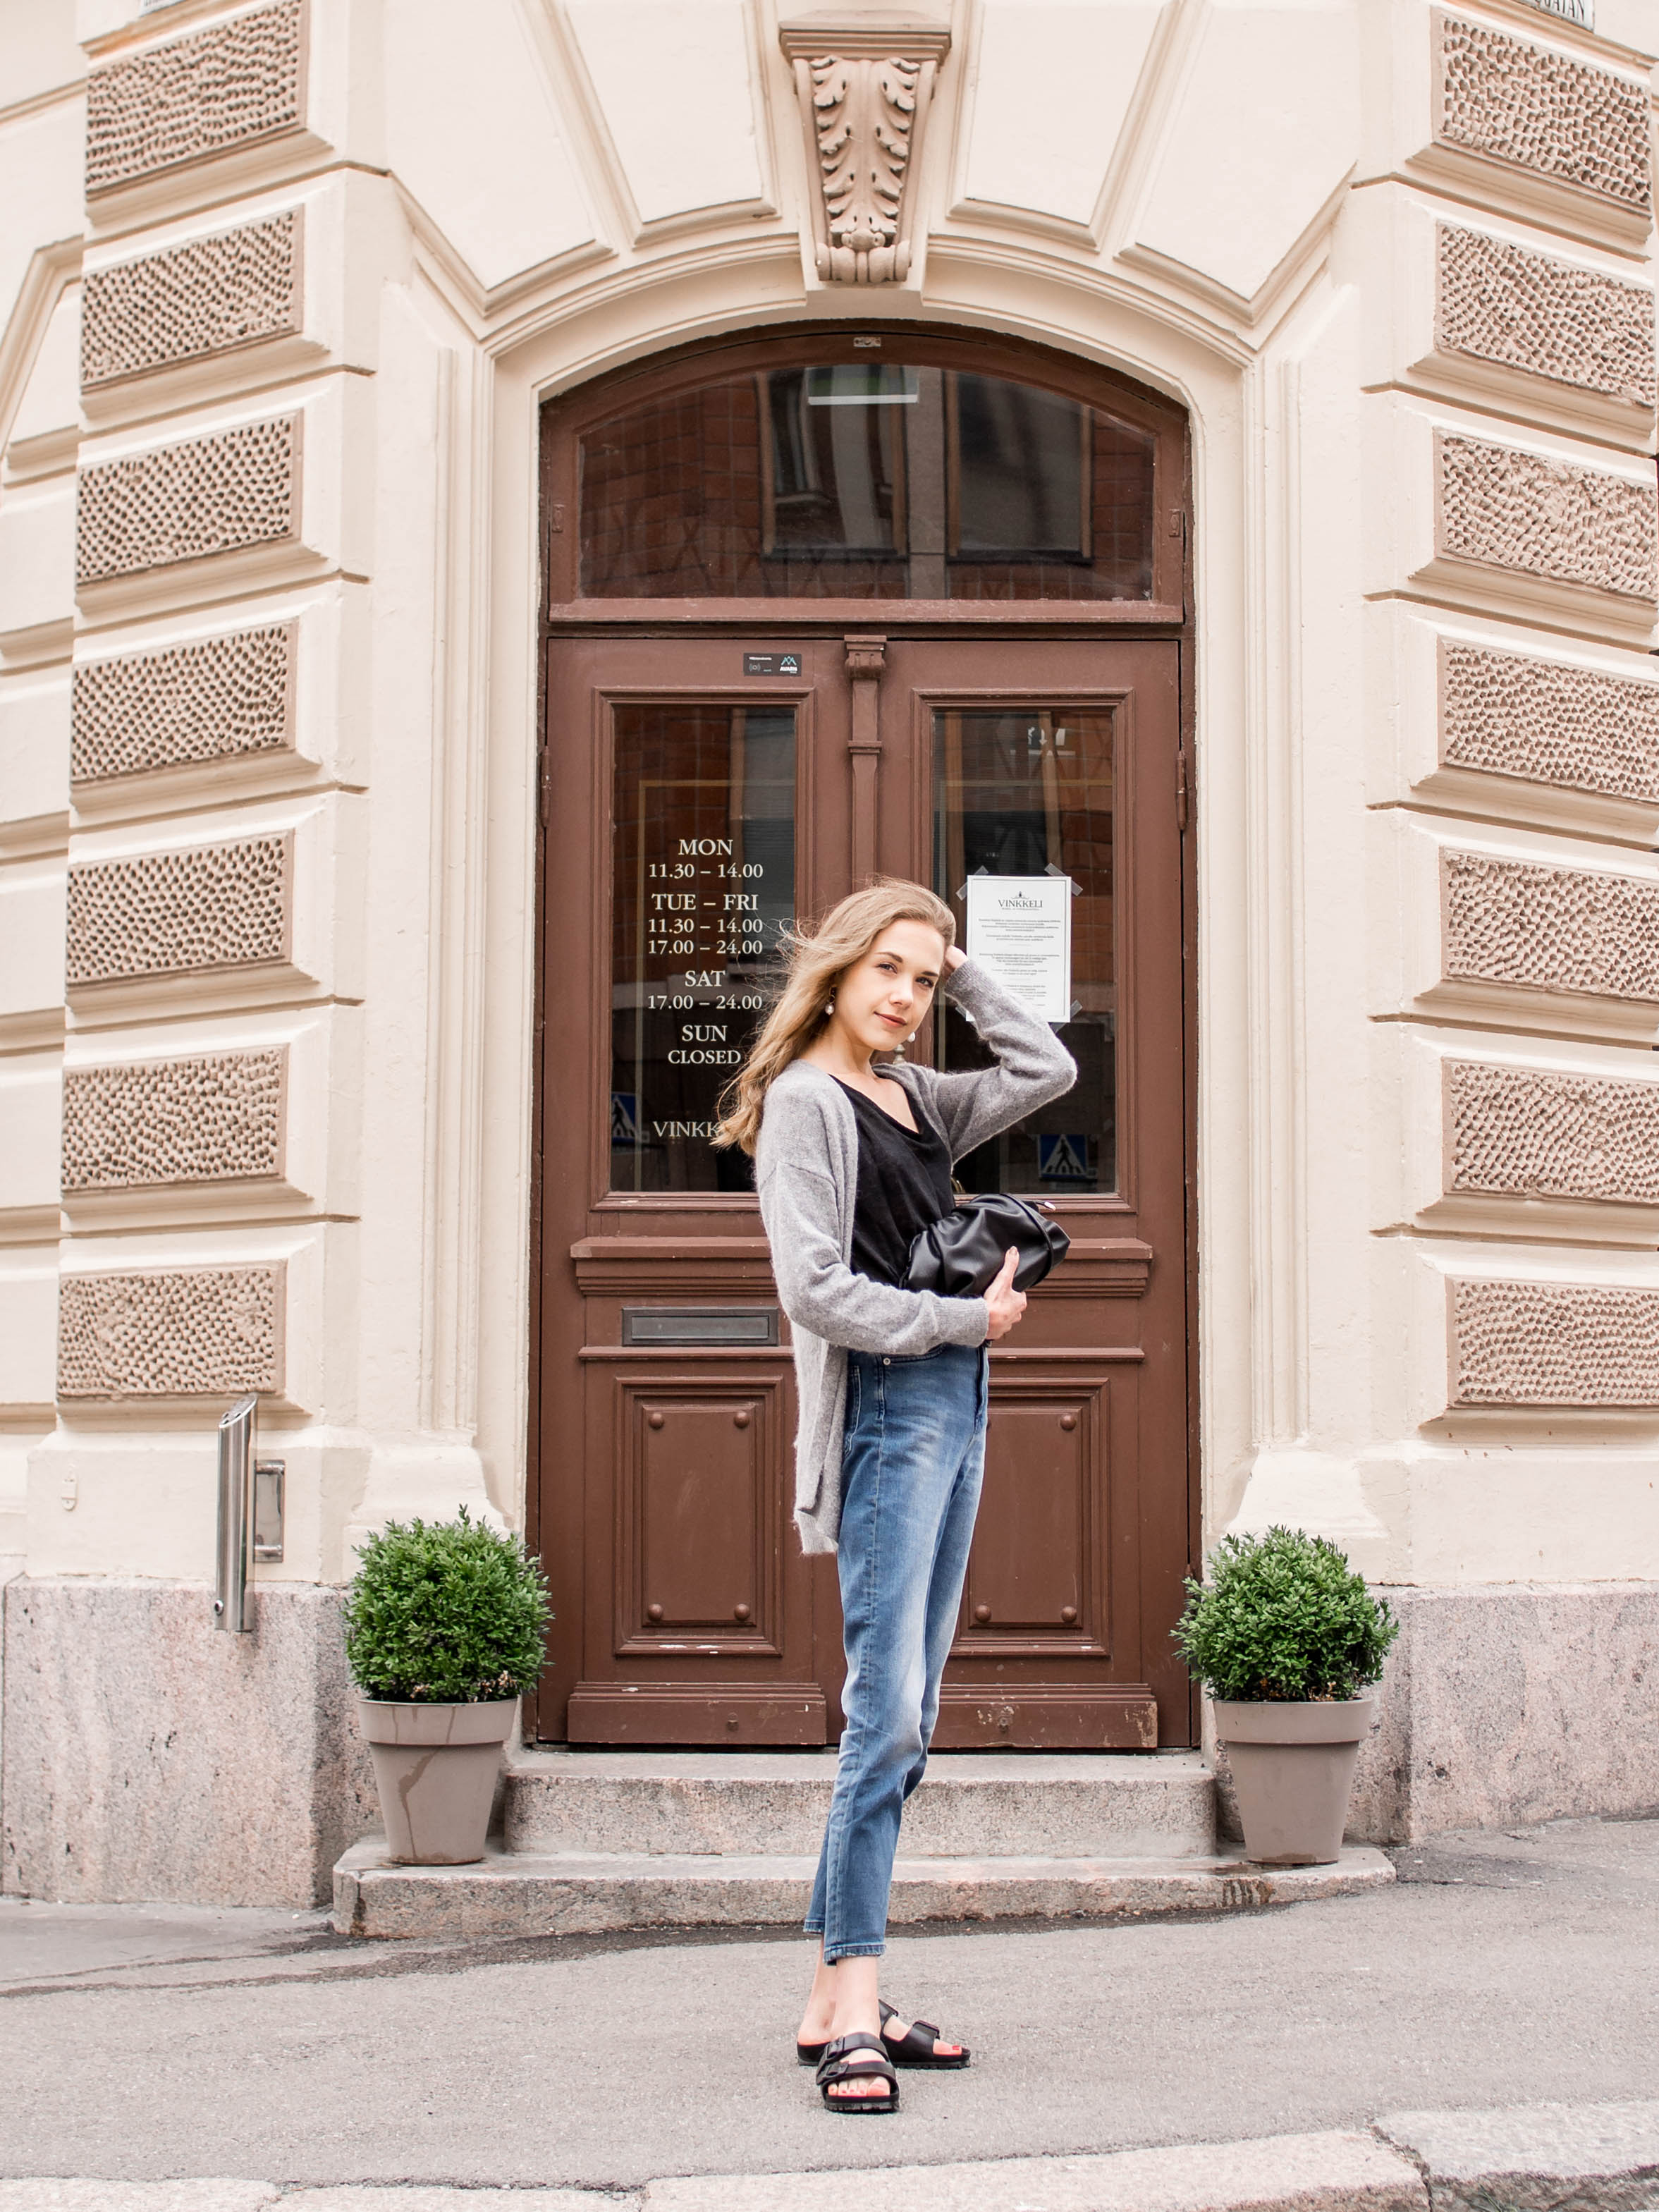 Casual fashion blogger denim outfit - Farkut, muotibloggaaja, asuinspiraatio